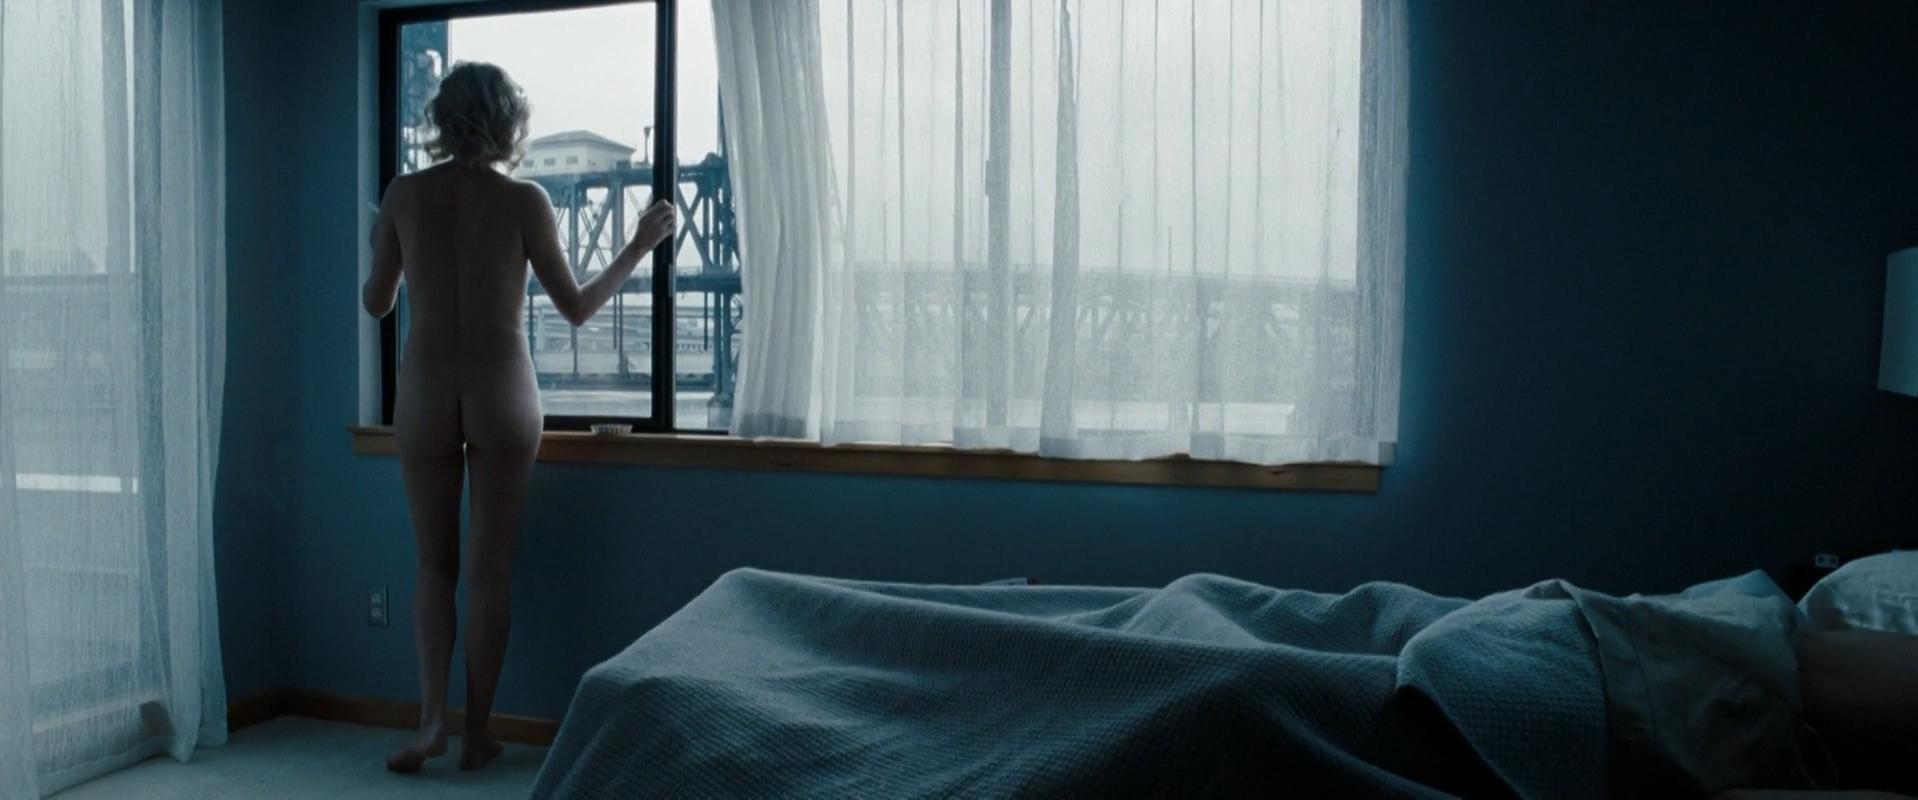 Charlize Theron nude - The Burning Plain (2008)